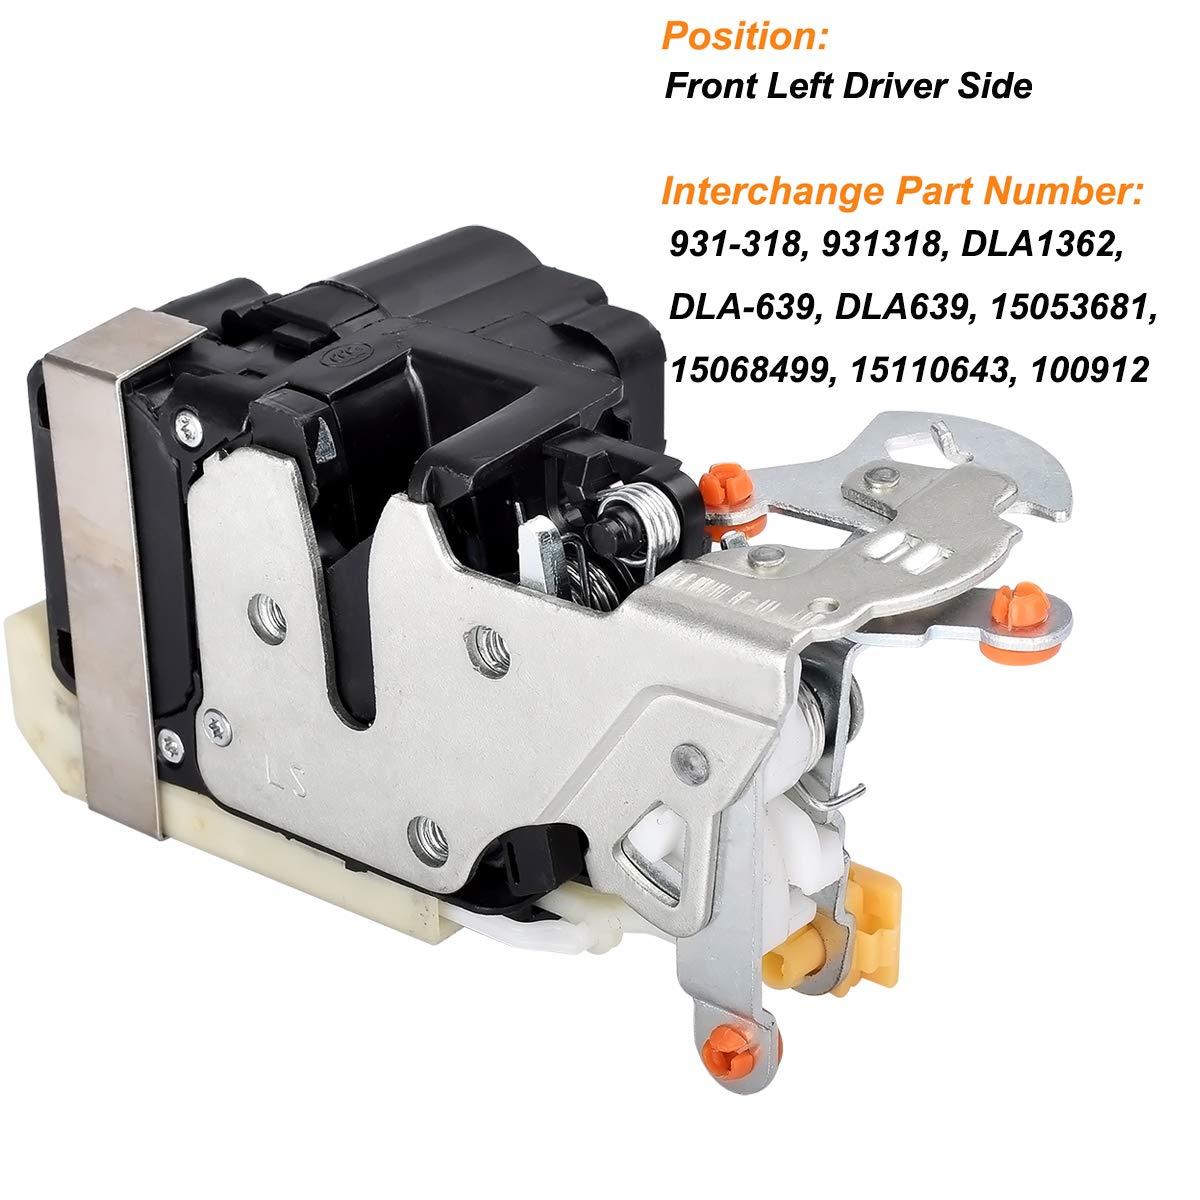 FAERSI Driver Side Front Door Lock Actuator for Lesabre Escalade Avalanche Silverado Suburban Tahoe Sierra Yukon Bonneville Replaces 931-318 15053681 15068499 15110643 DLA639